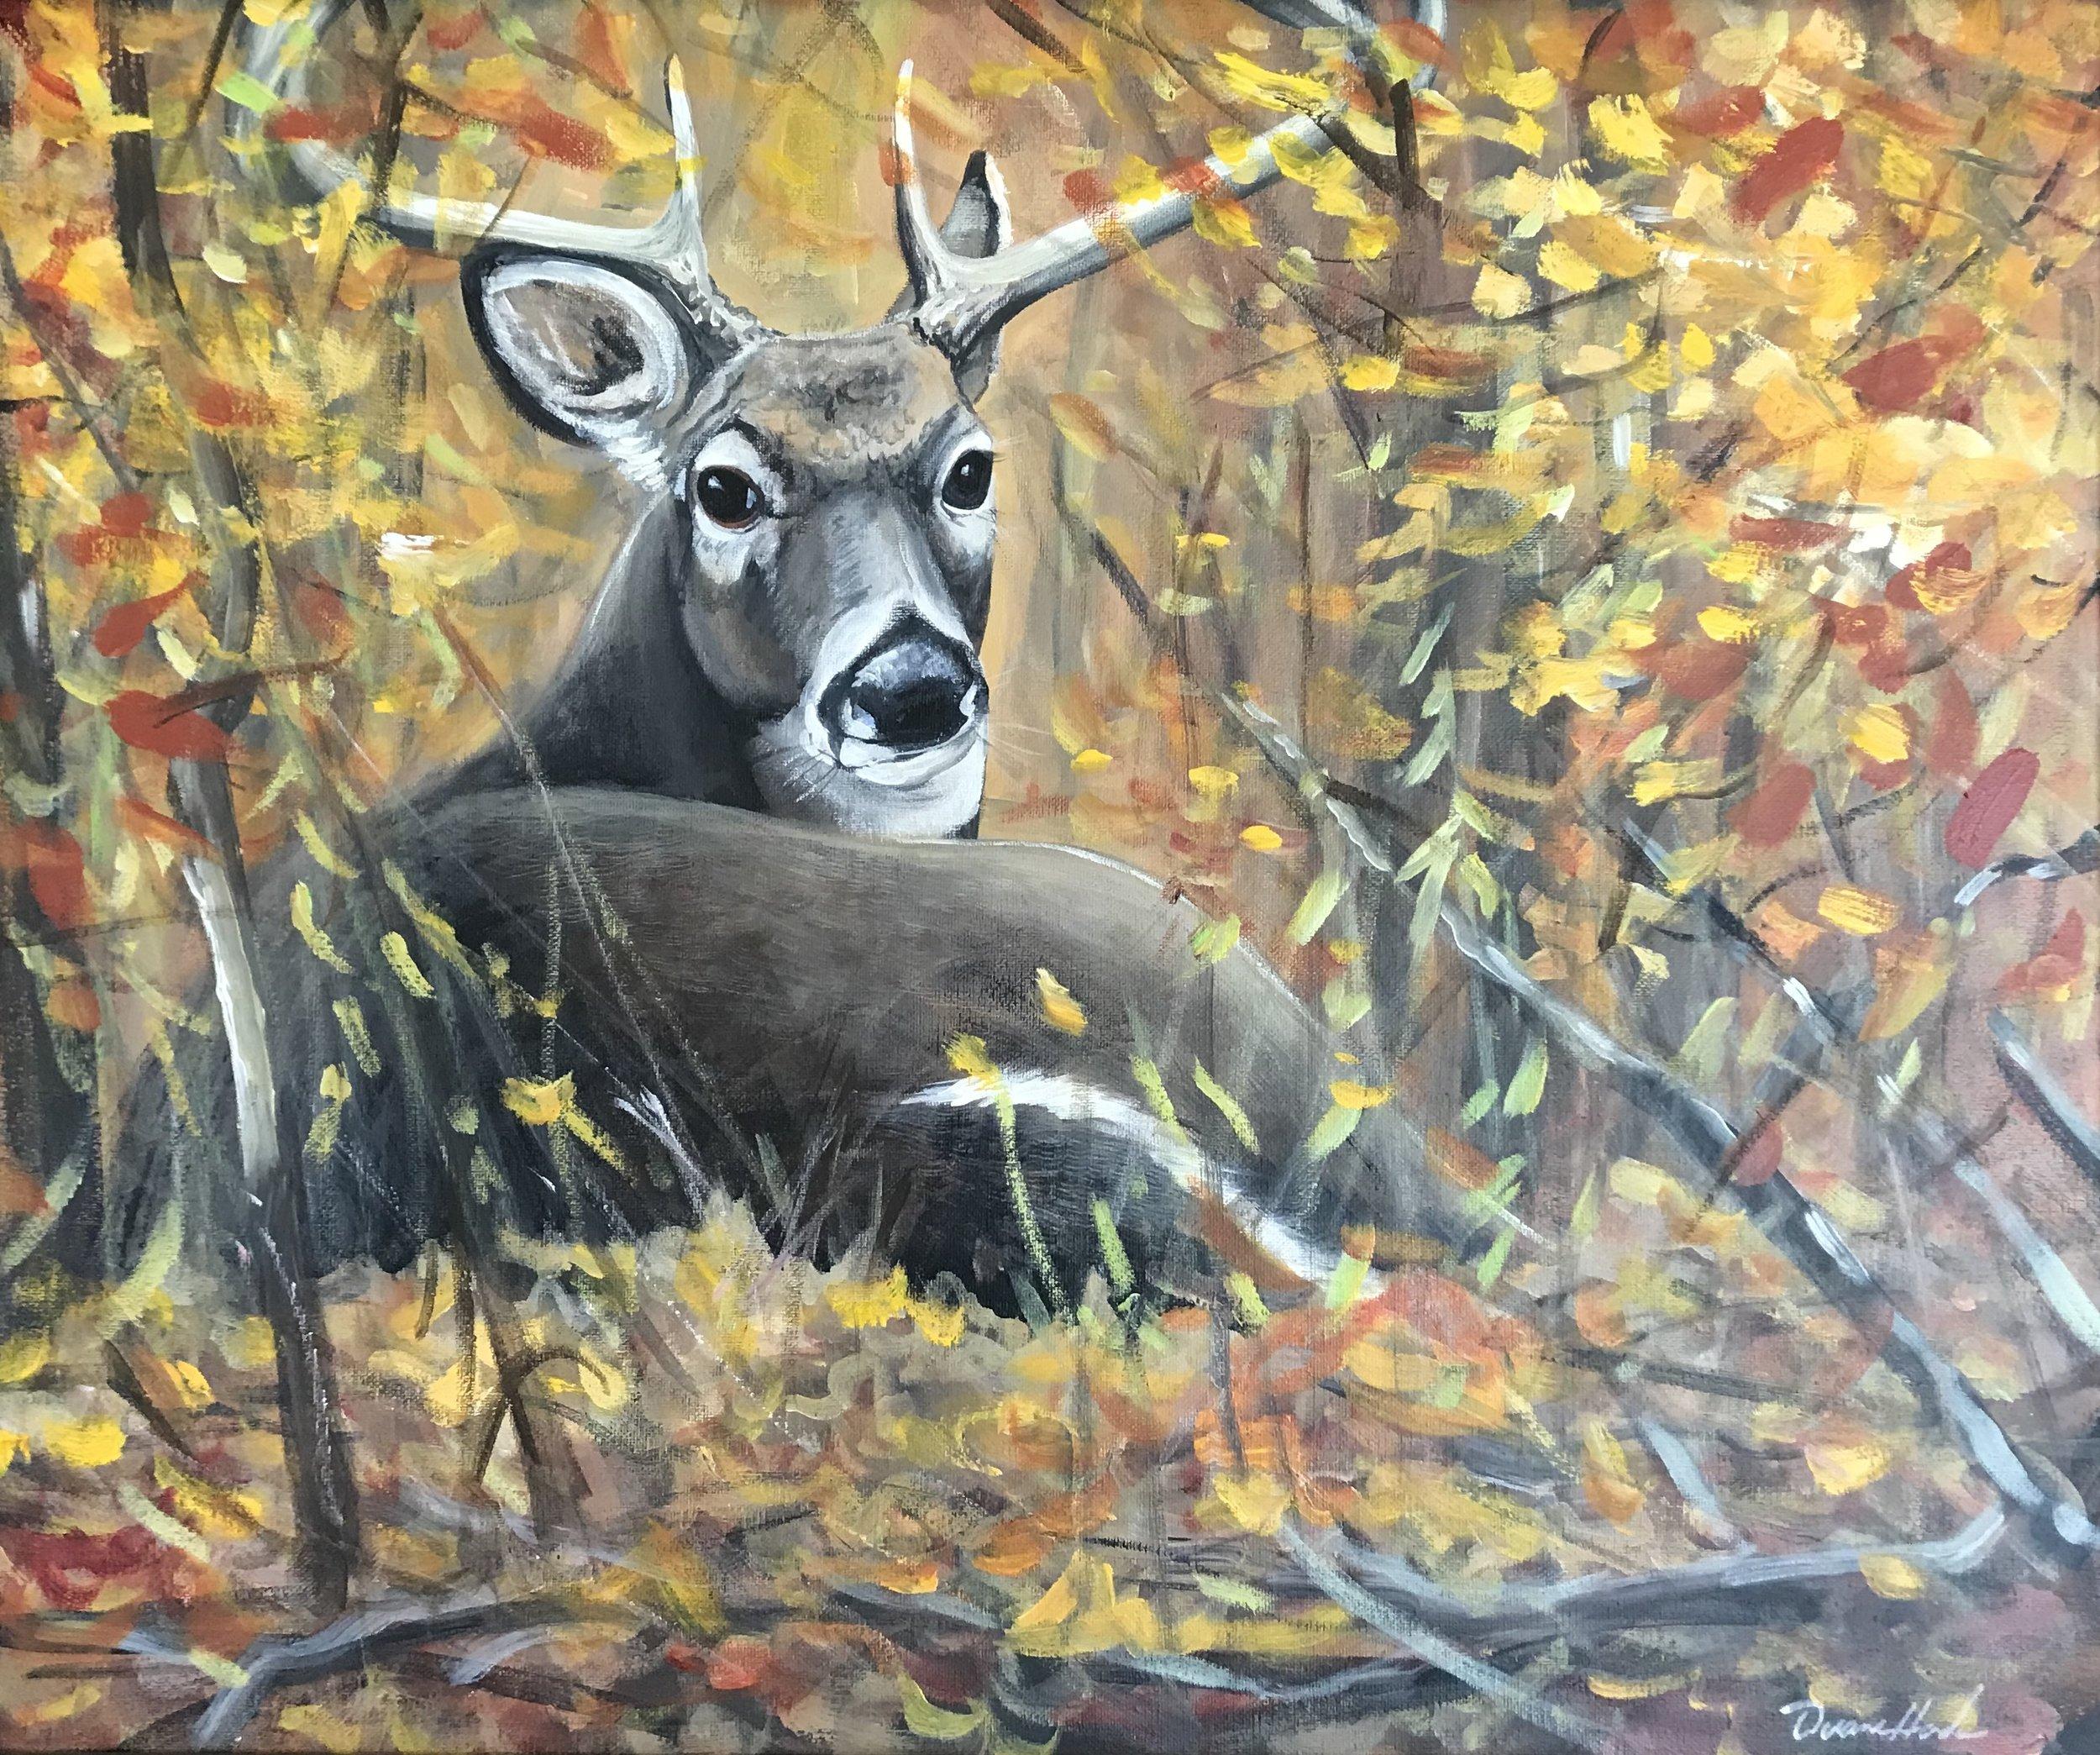 Sanctuary - Acrylic20 x 24$1440.00